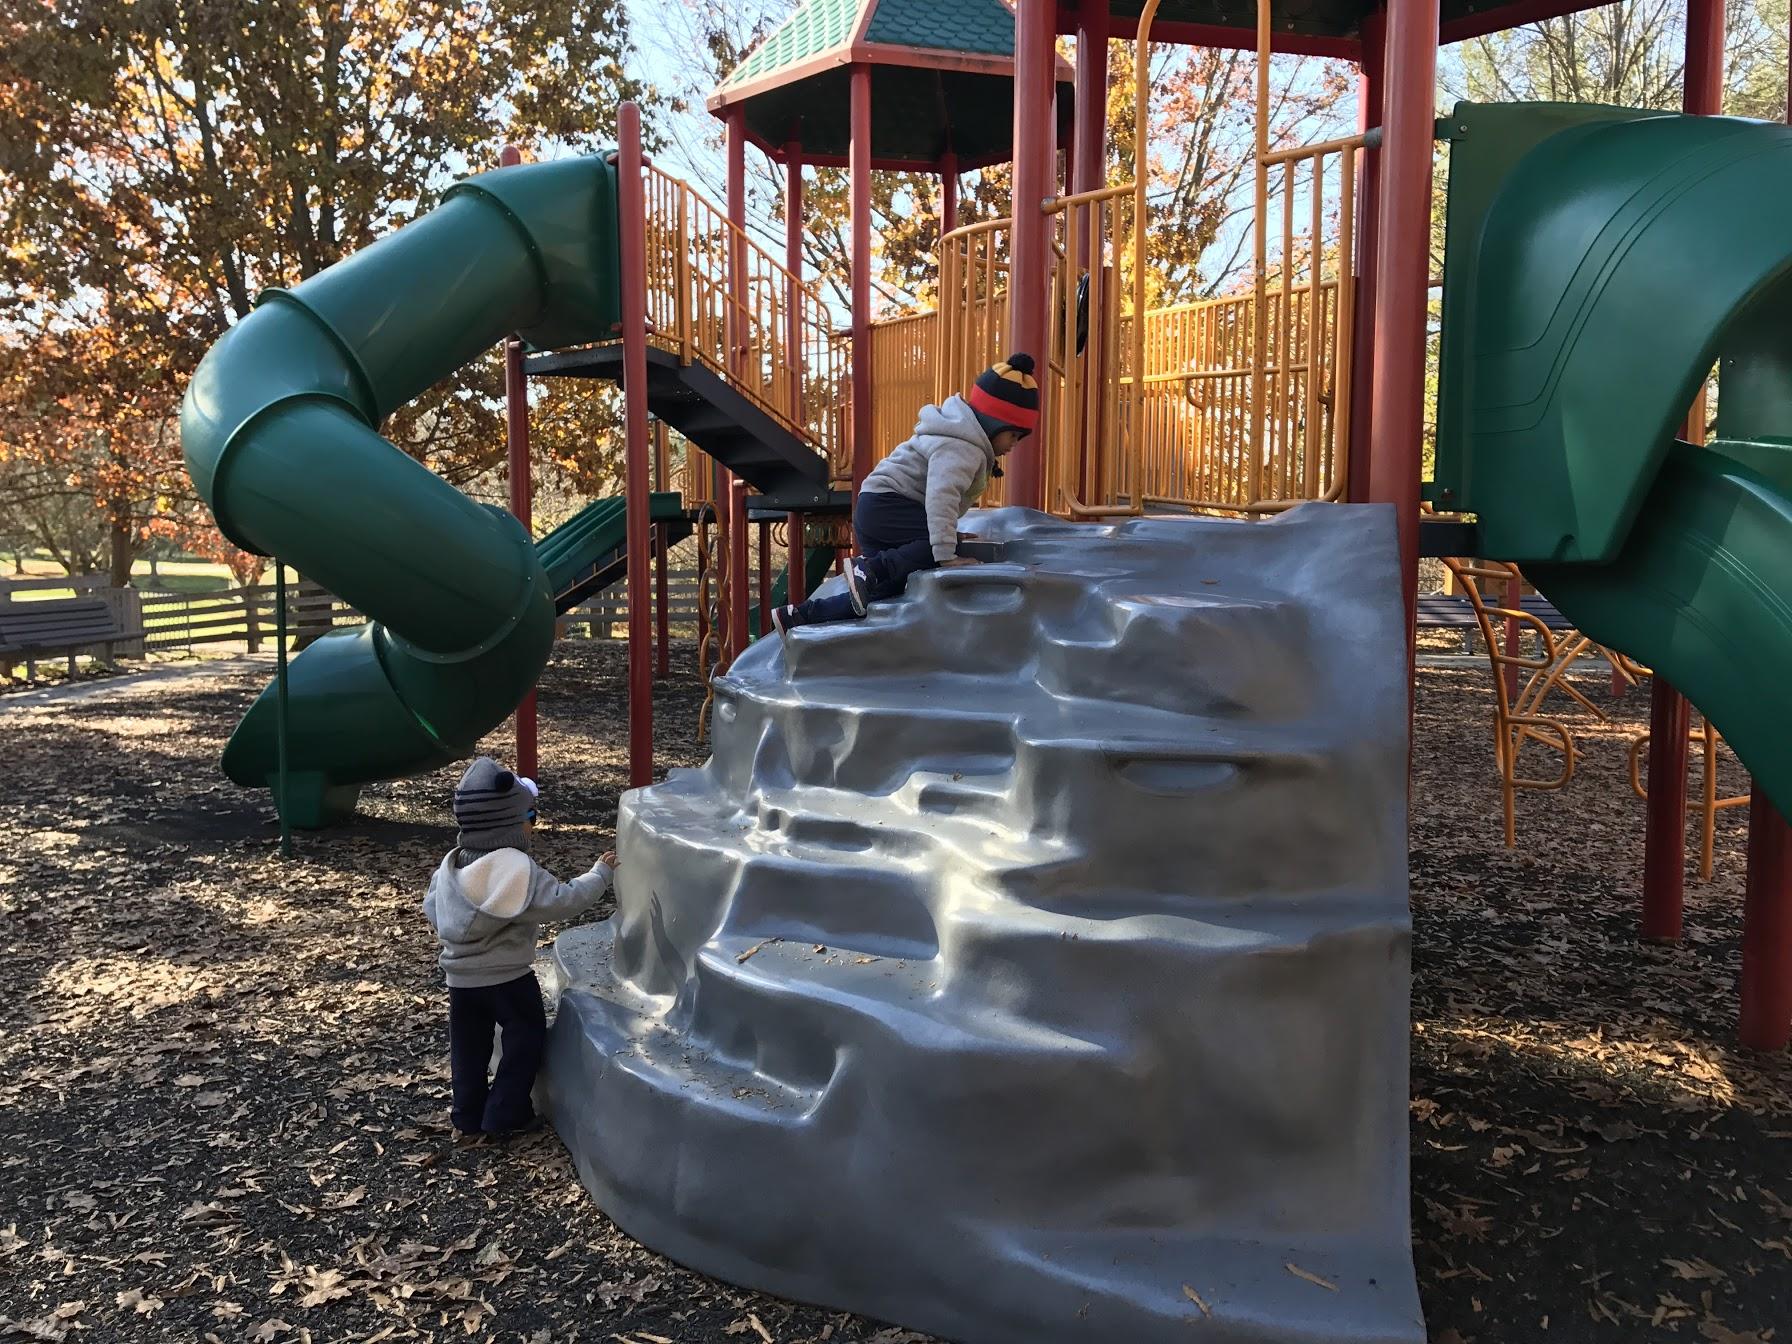 Centennial Park South Playground